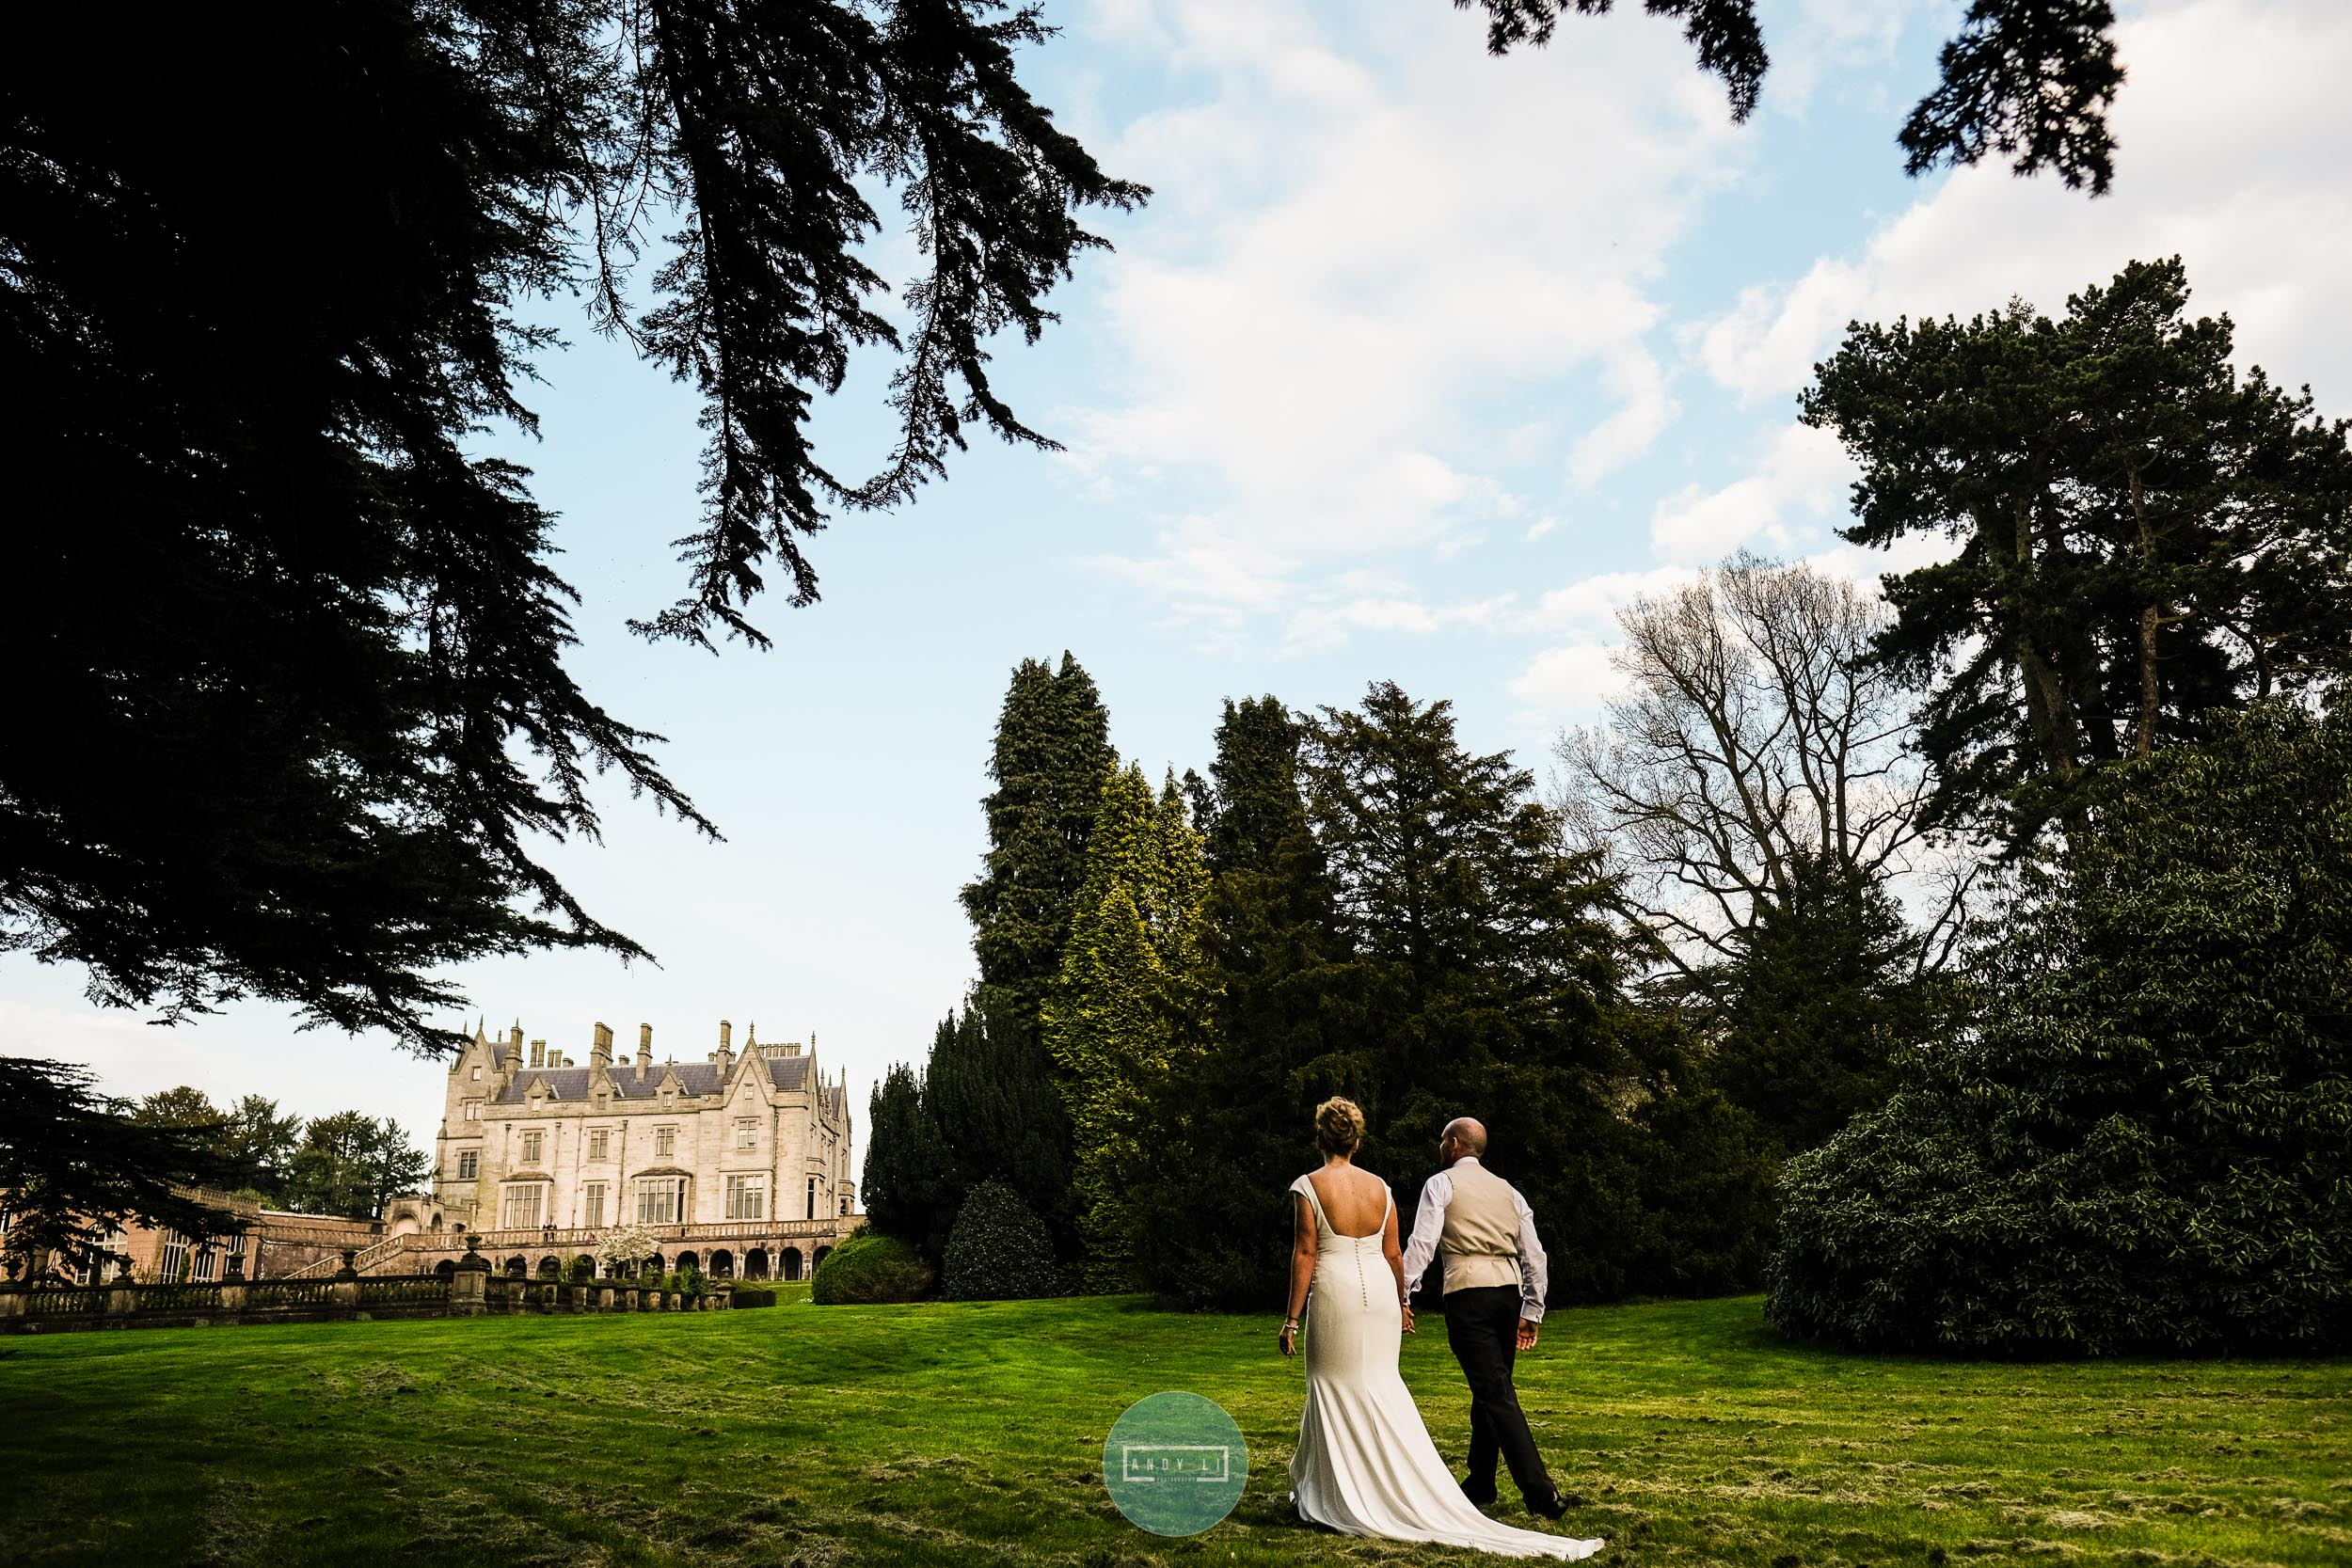 Lilleshall Hall Wedding Photographer-067-XPRO1472.jpg